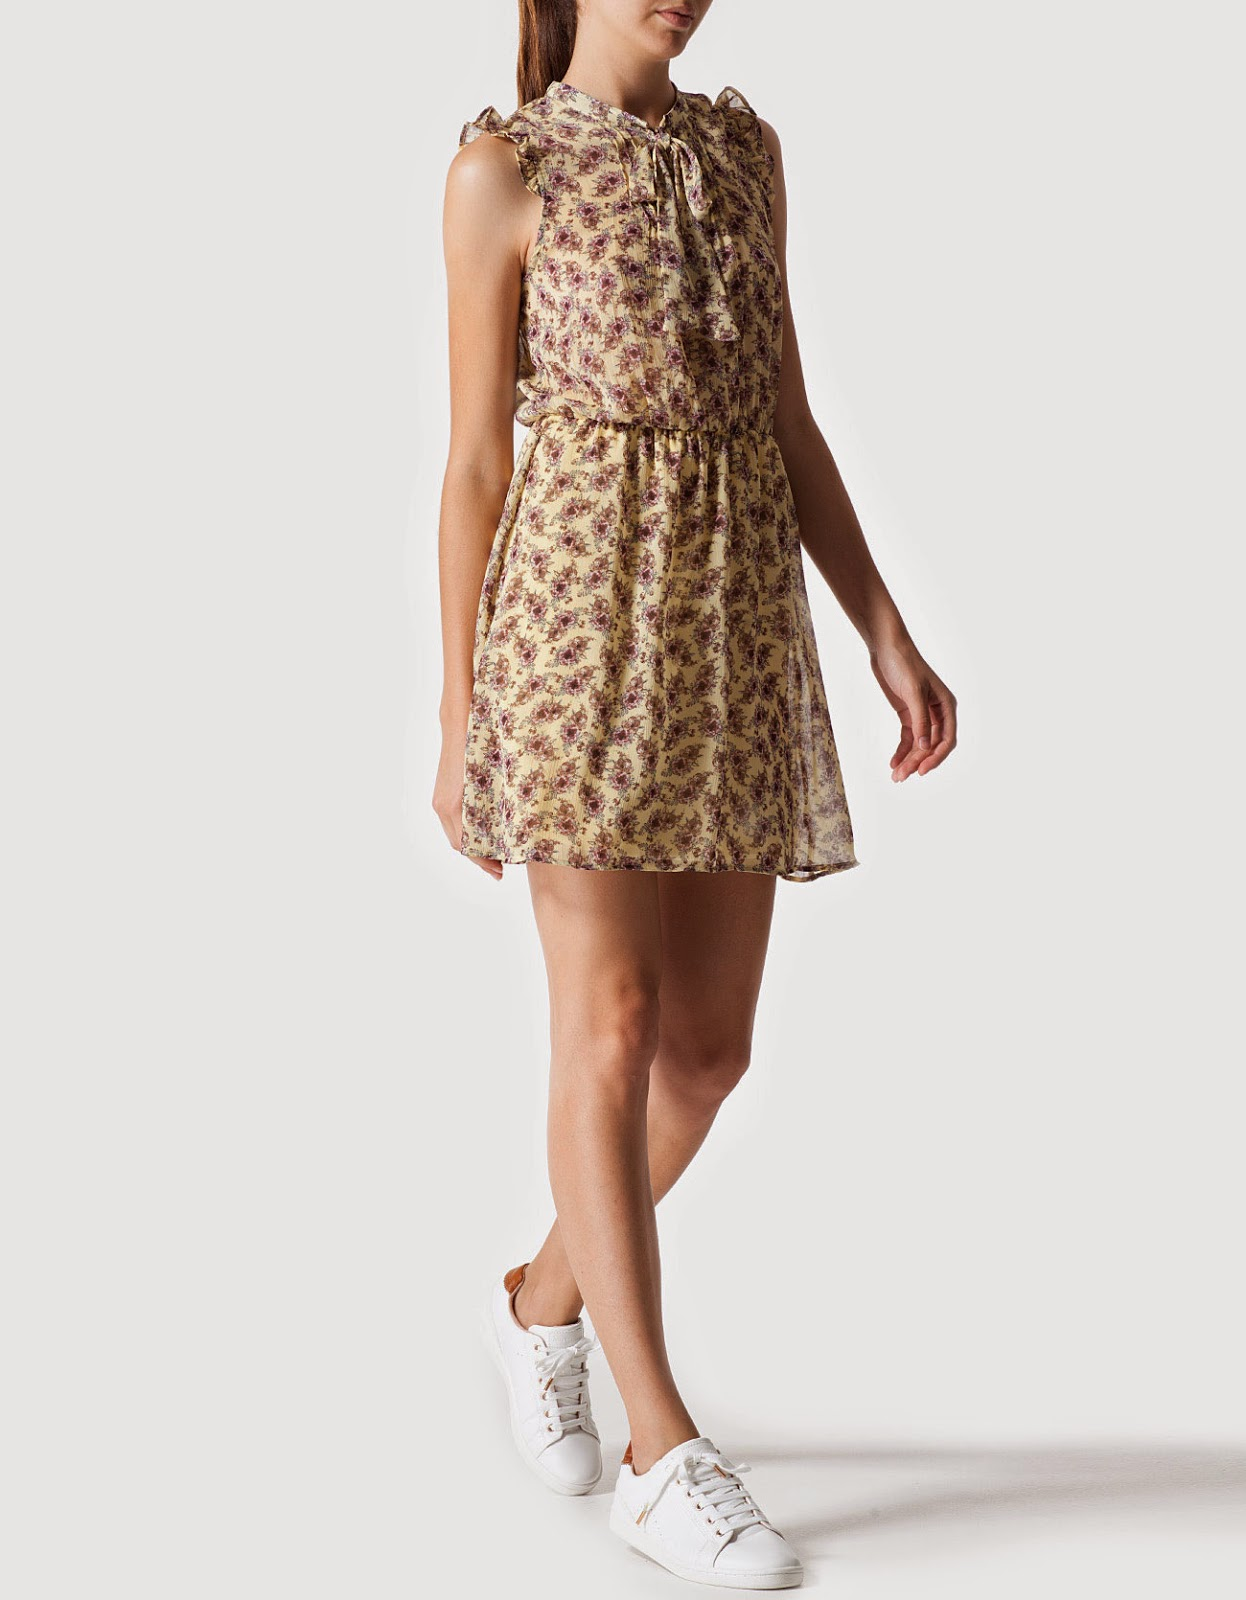 http://www.stradivarius.com/es/es/ropa/vestidos-c1267005p4394045.html?categoryNav=1267005&colorId=442